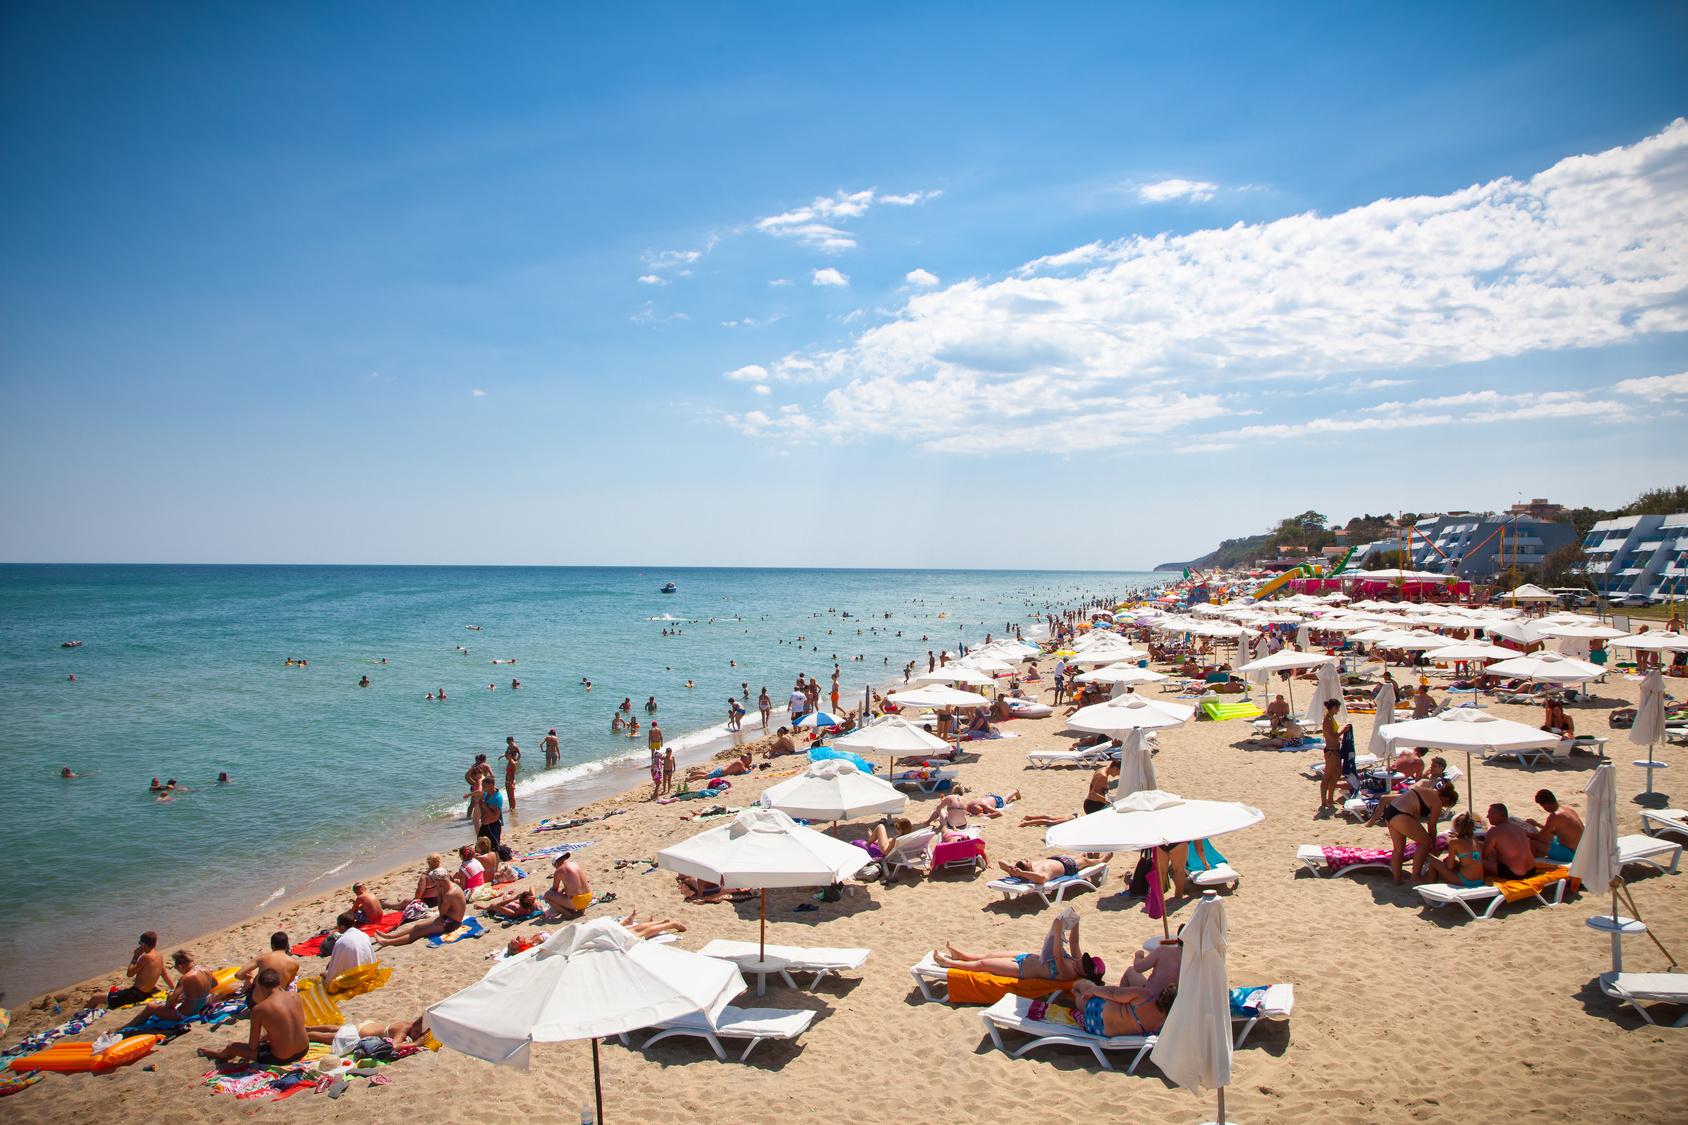 Słoneczna Bułgaria na Lato 2018